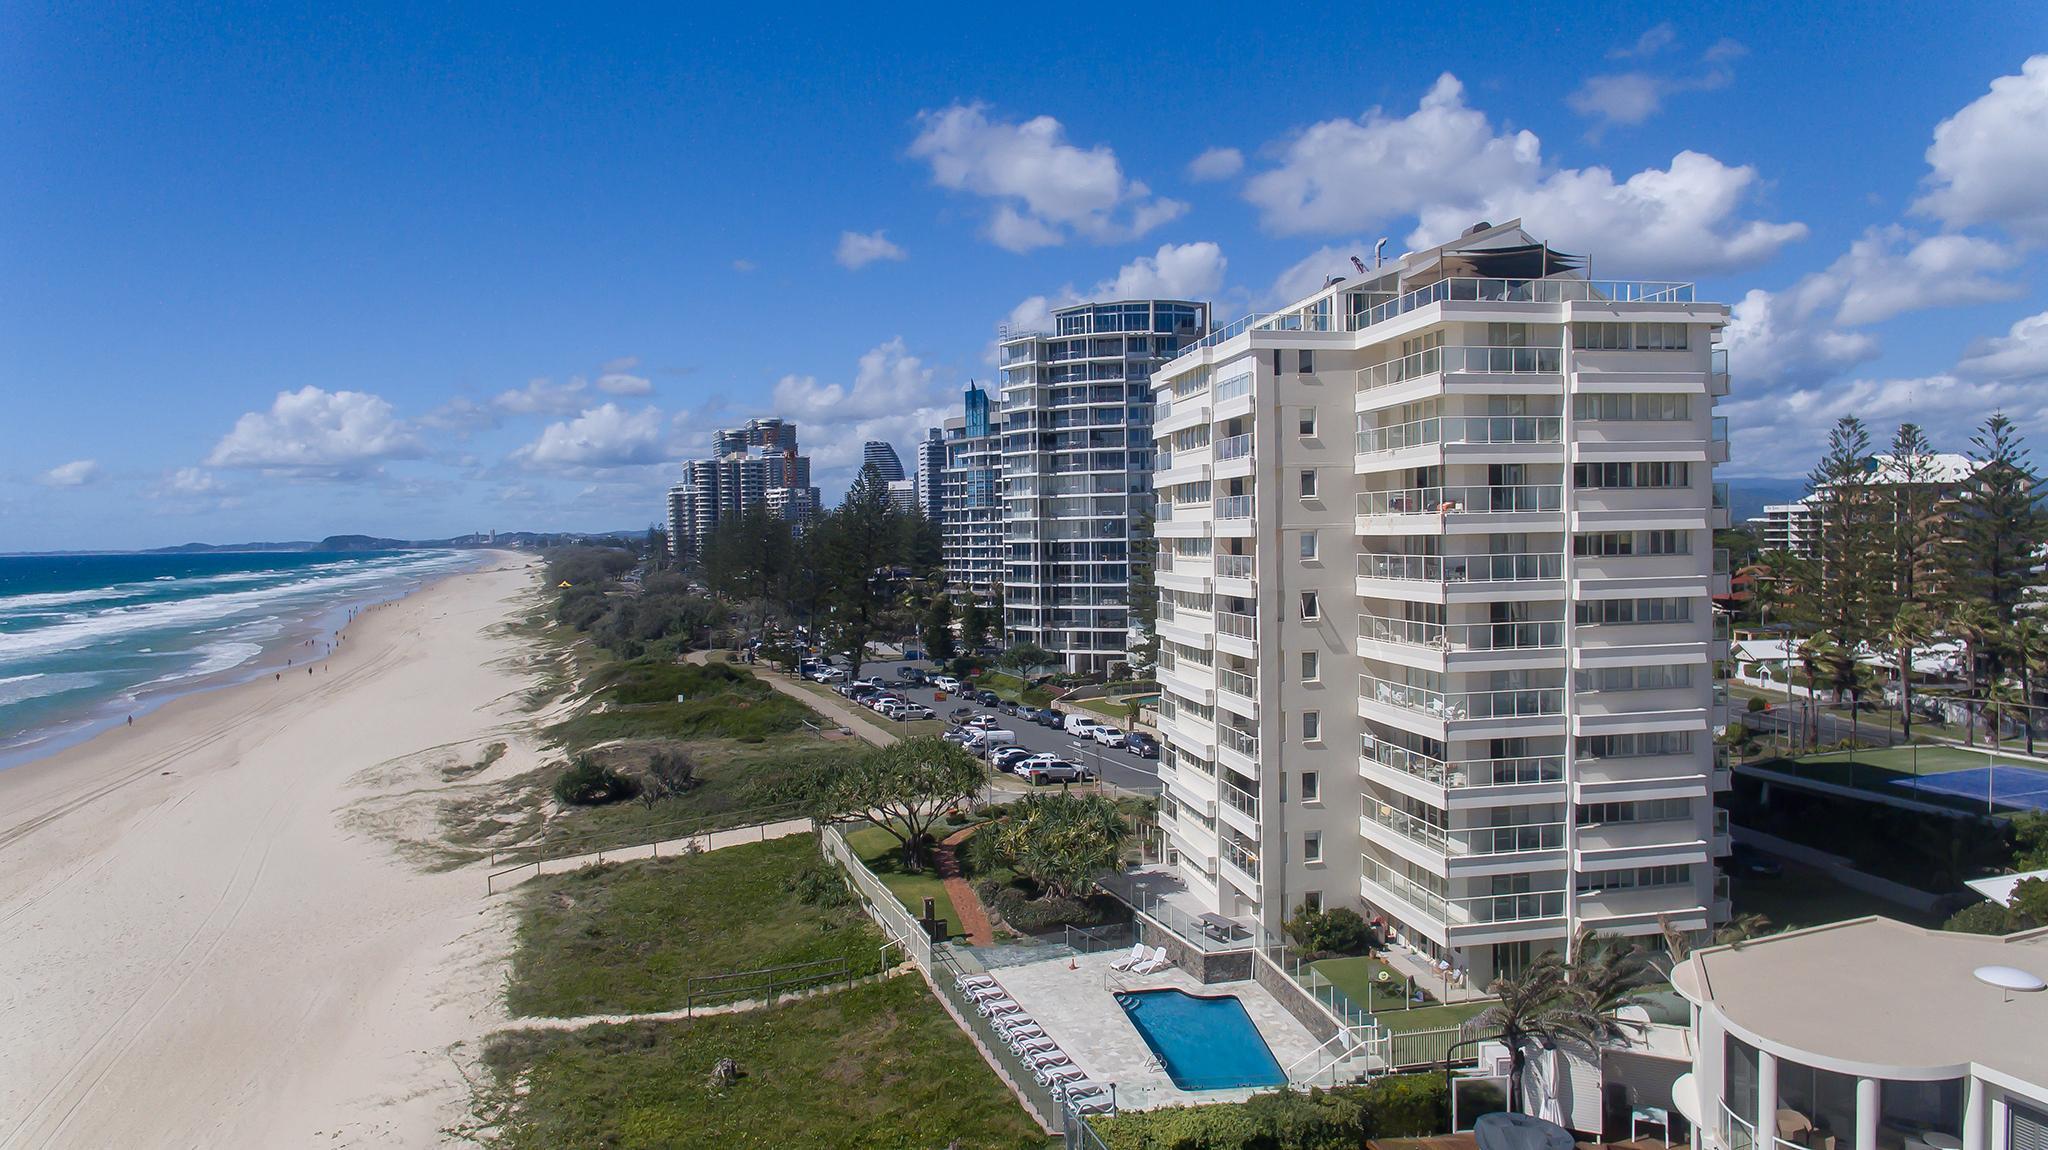 Beachfront Viscount Apartments